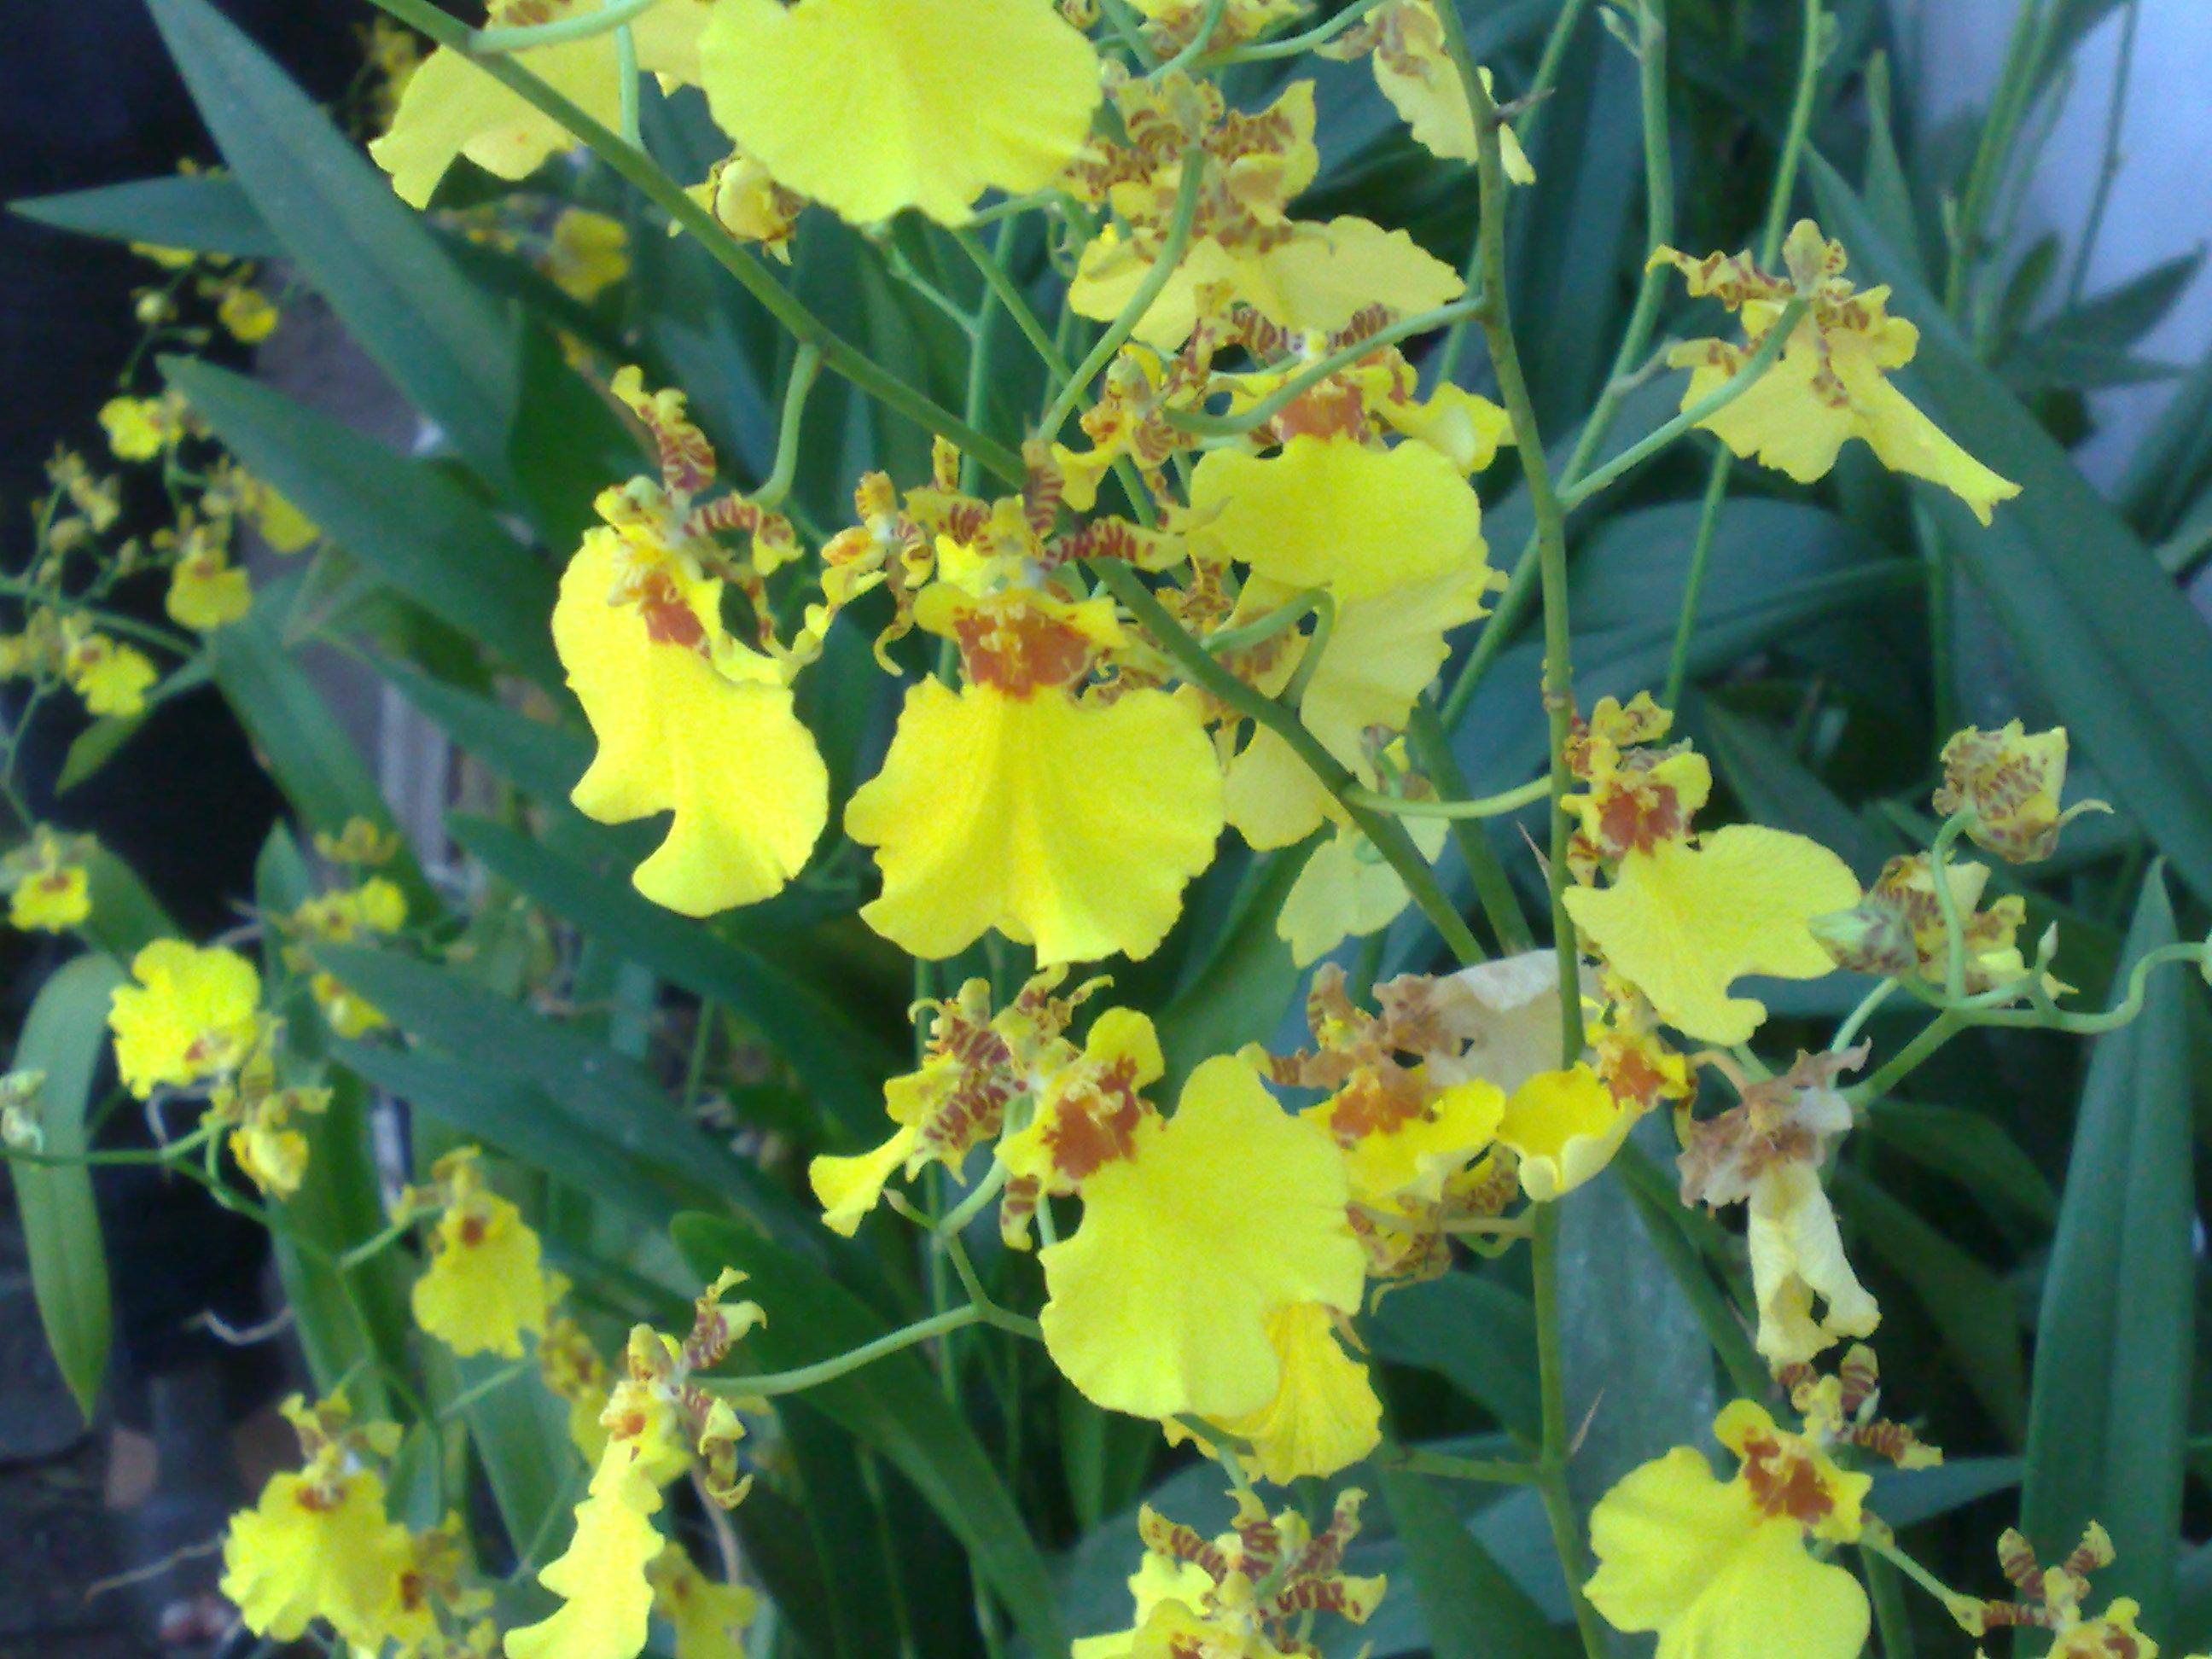 Floral Chuva de Ouro Florais Filhas de Gaia